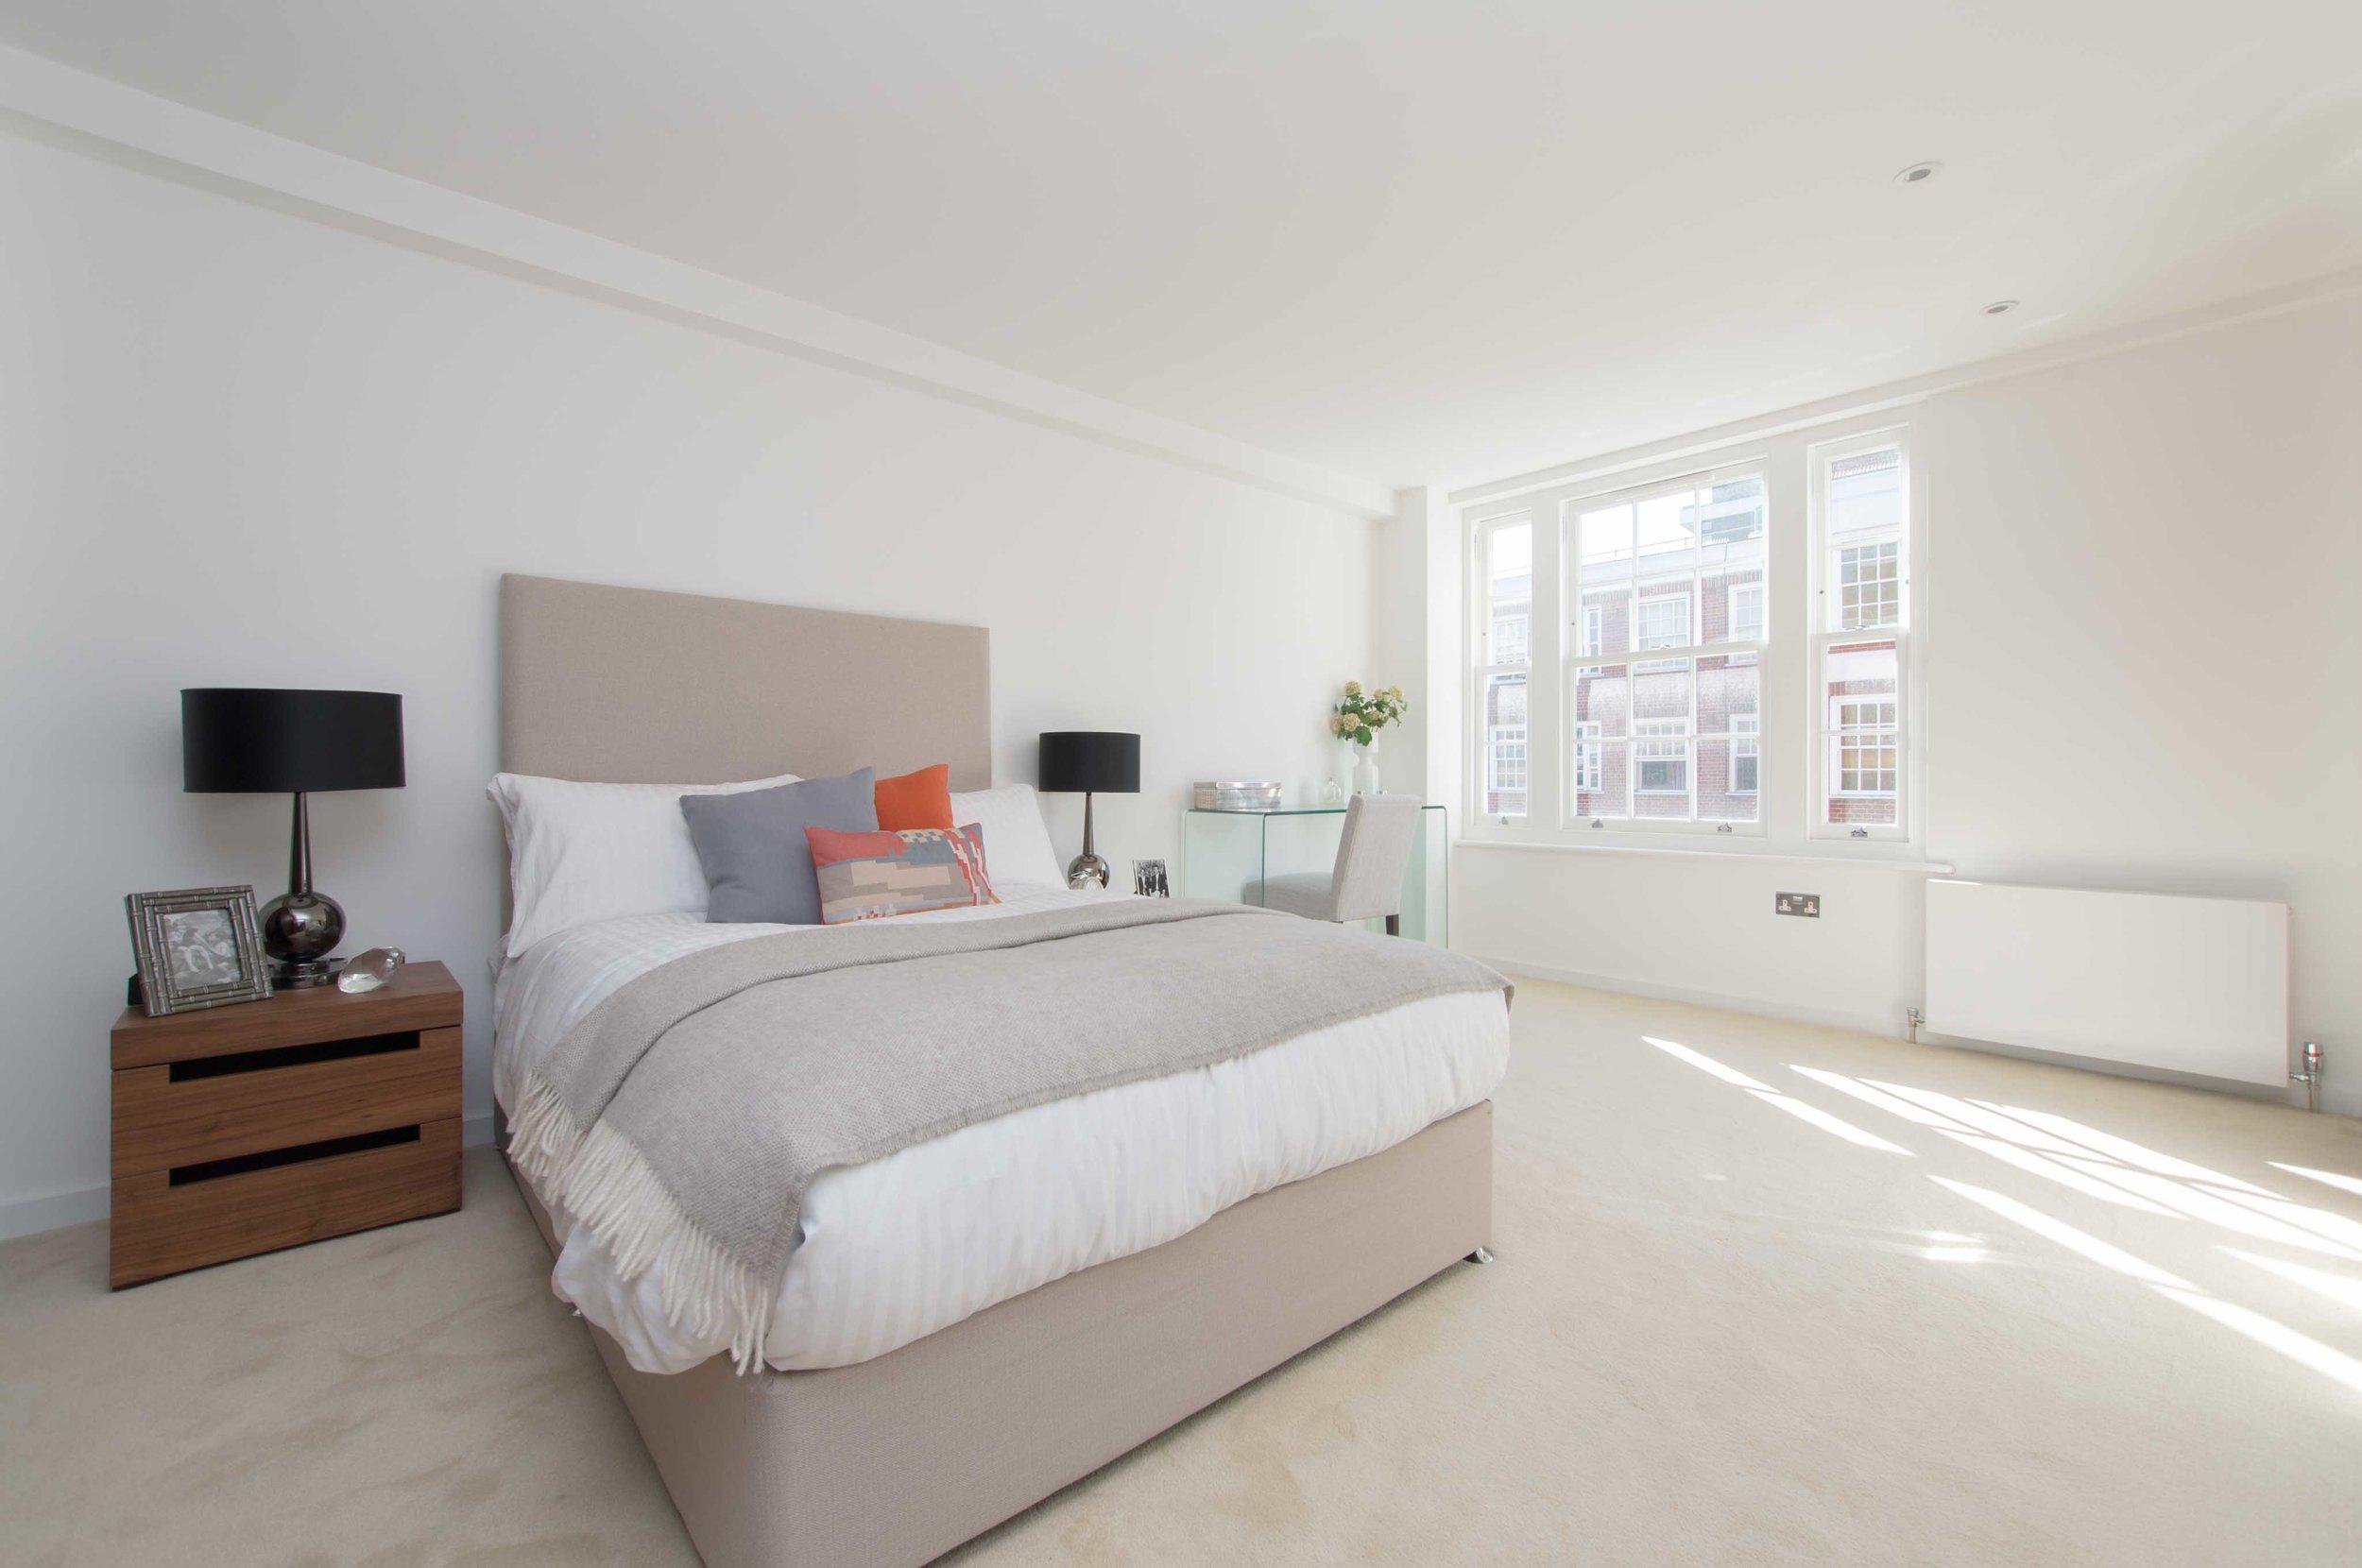 Bedroom-2.jpg